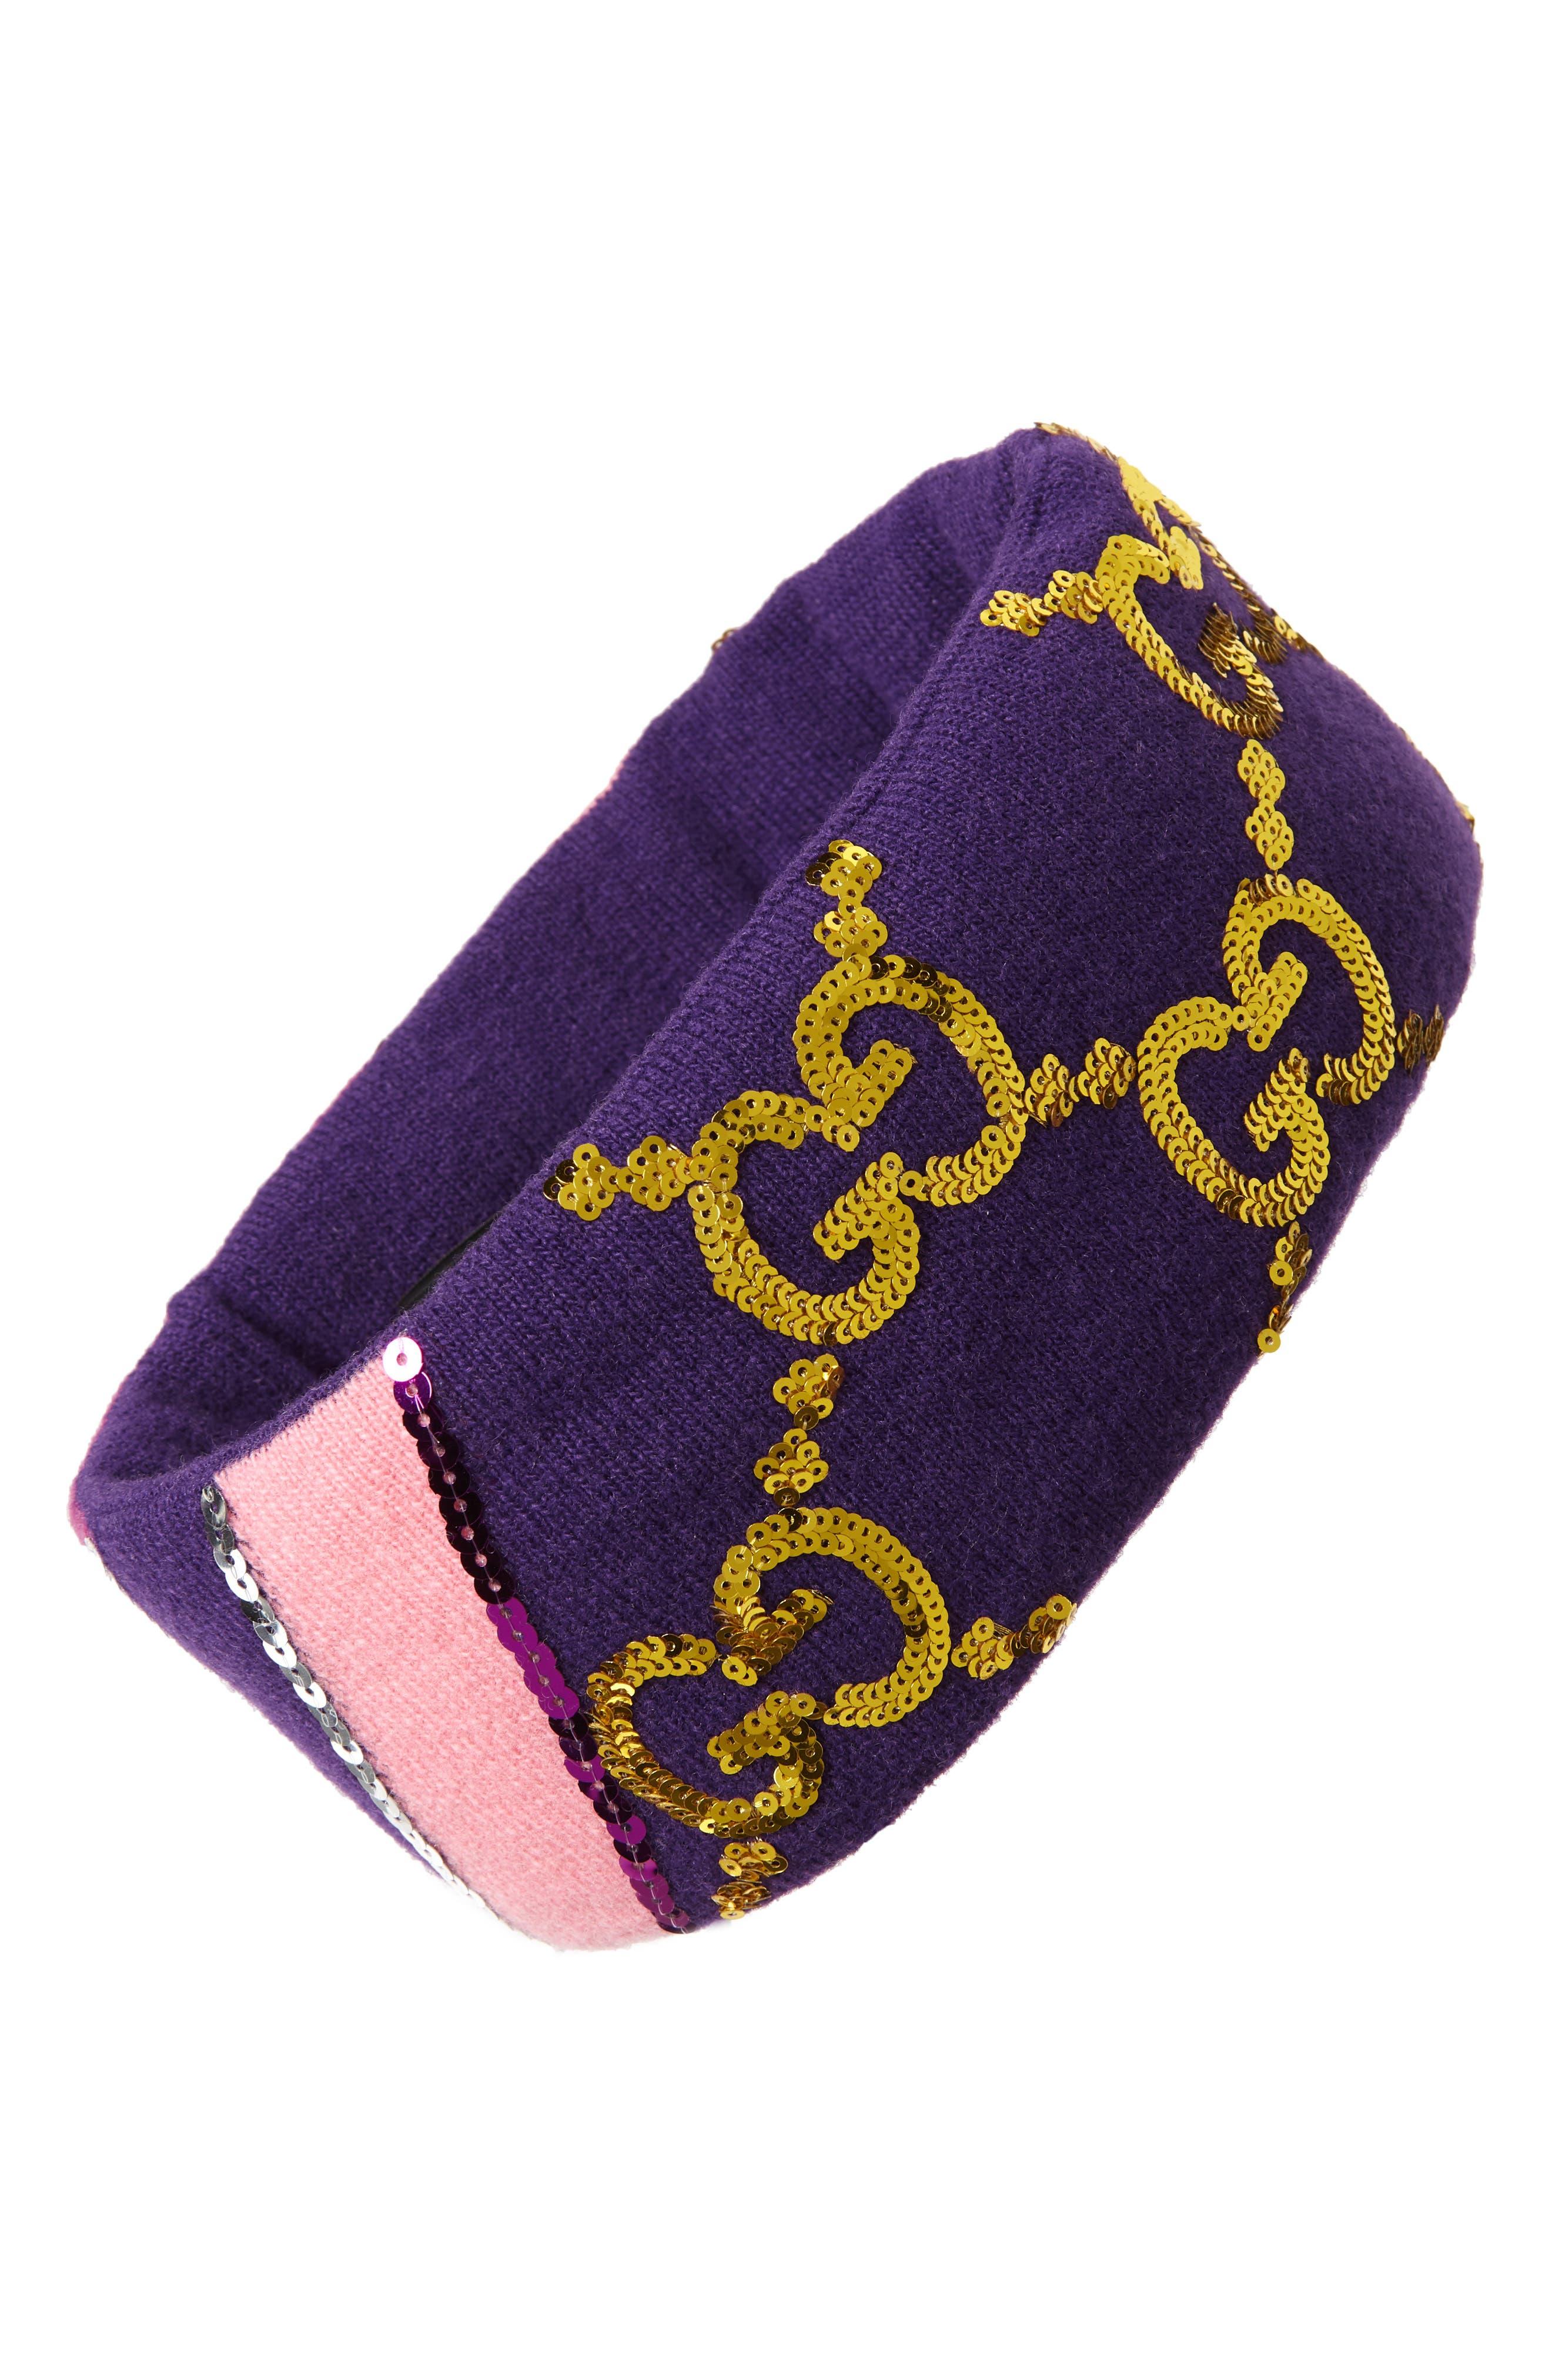 GG Sequin Headband,                         Main,                         color, PARMA VIOLET/ PINK